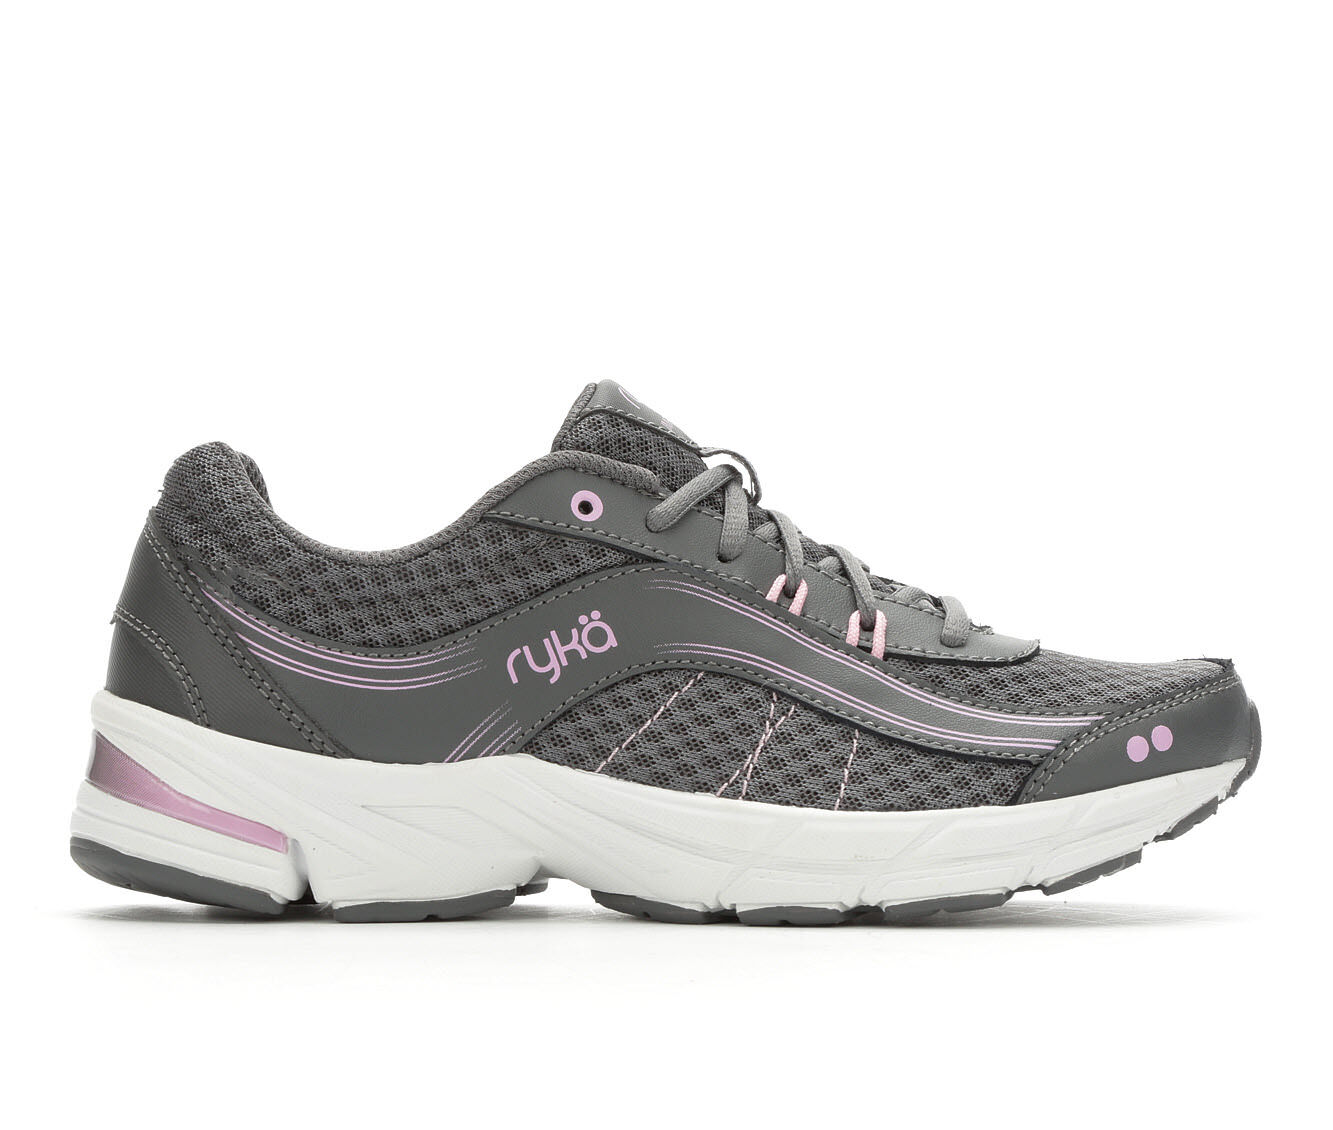 Women's Ryka Impulse Walking Shoes